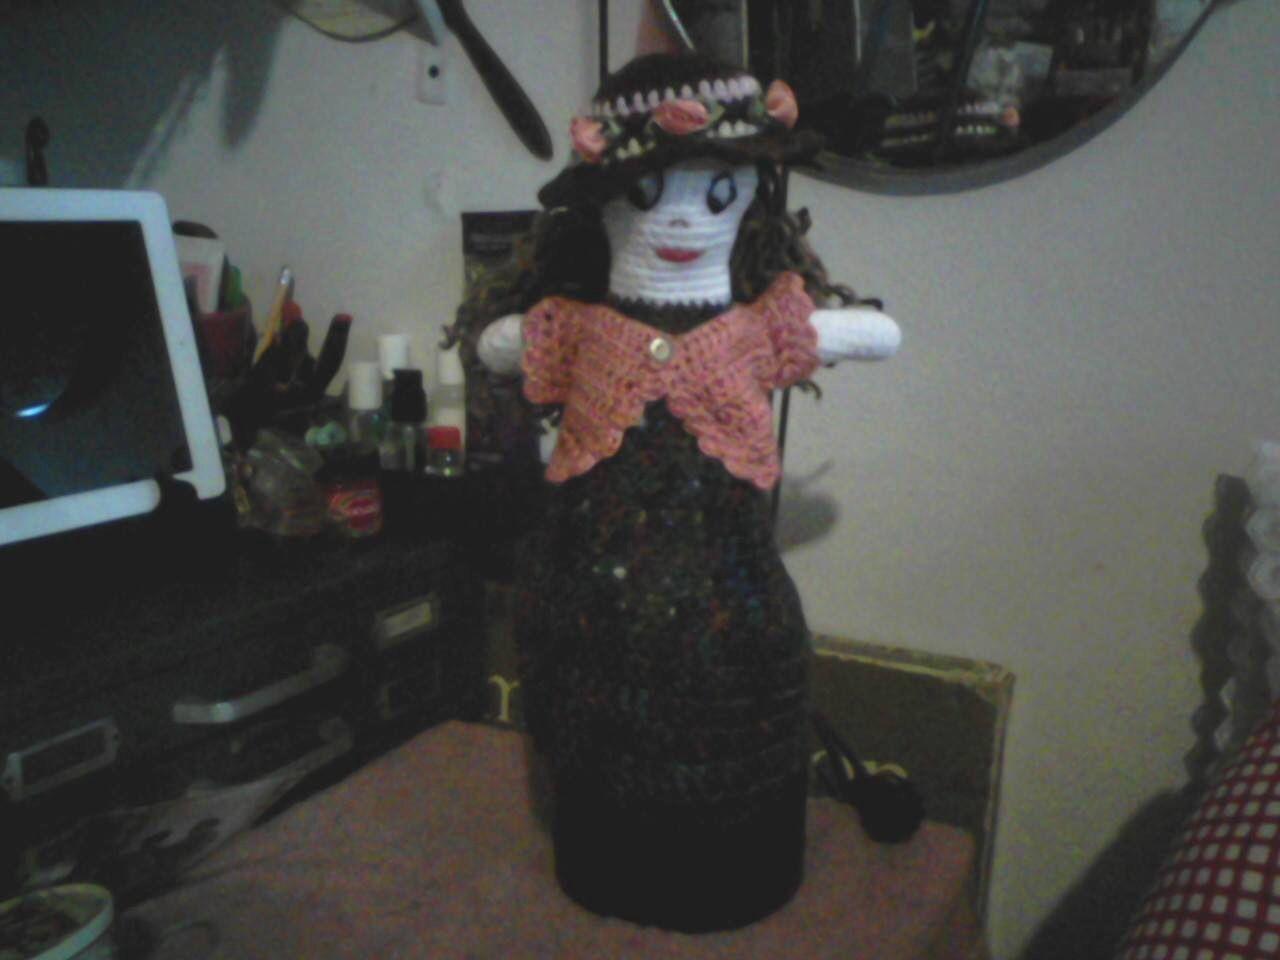 Muñeca crochet porta bolsas plásticas